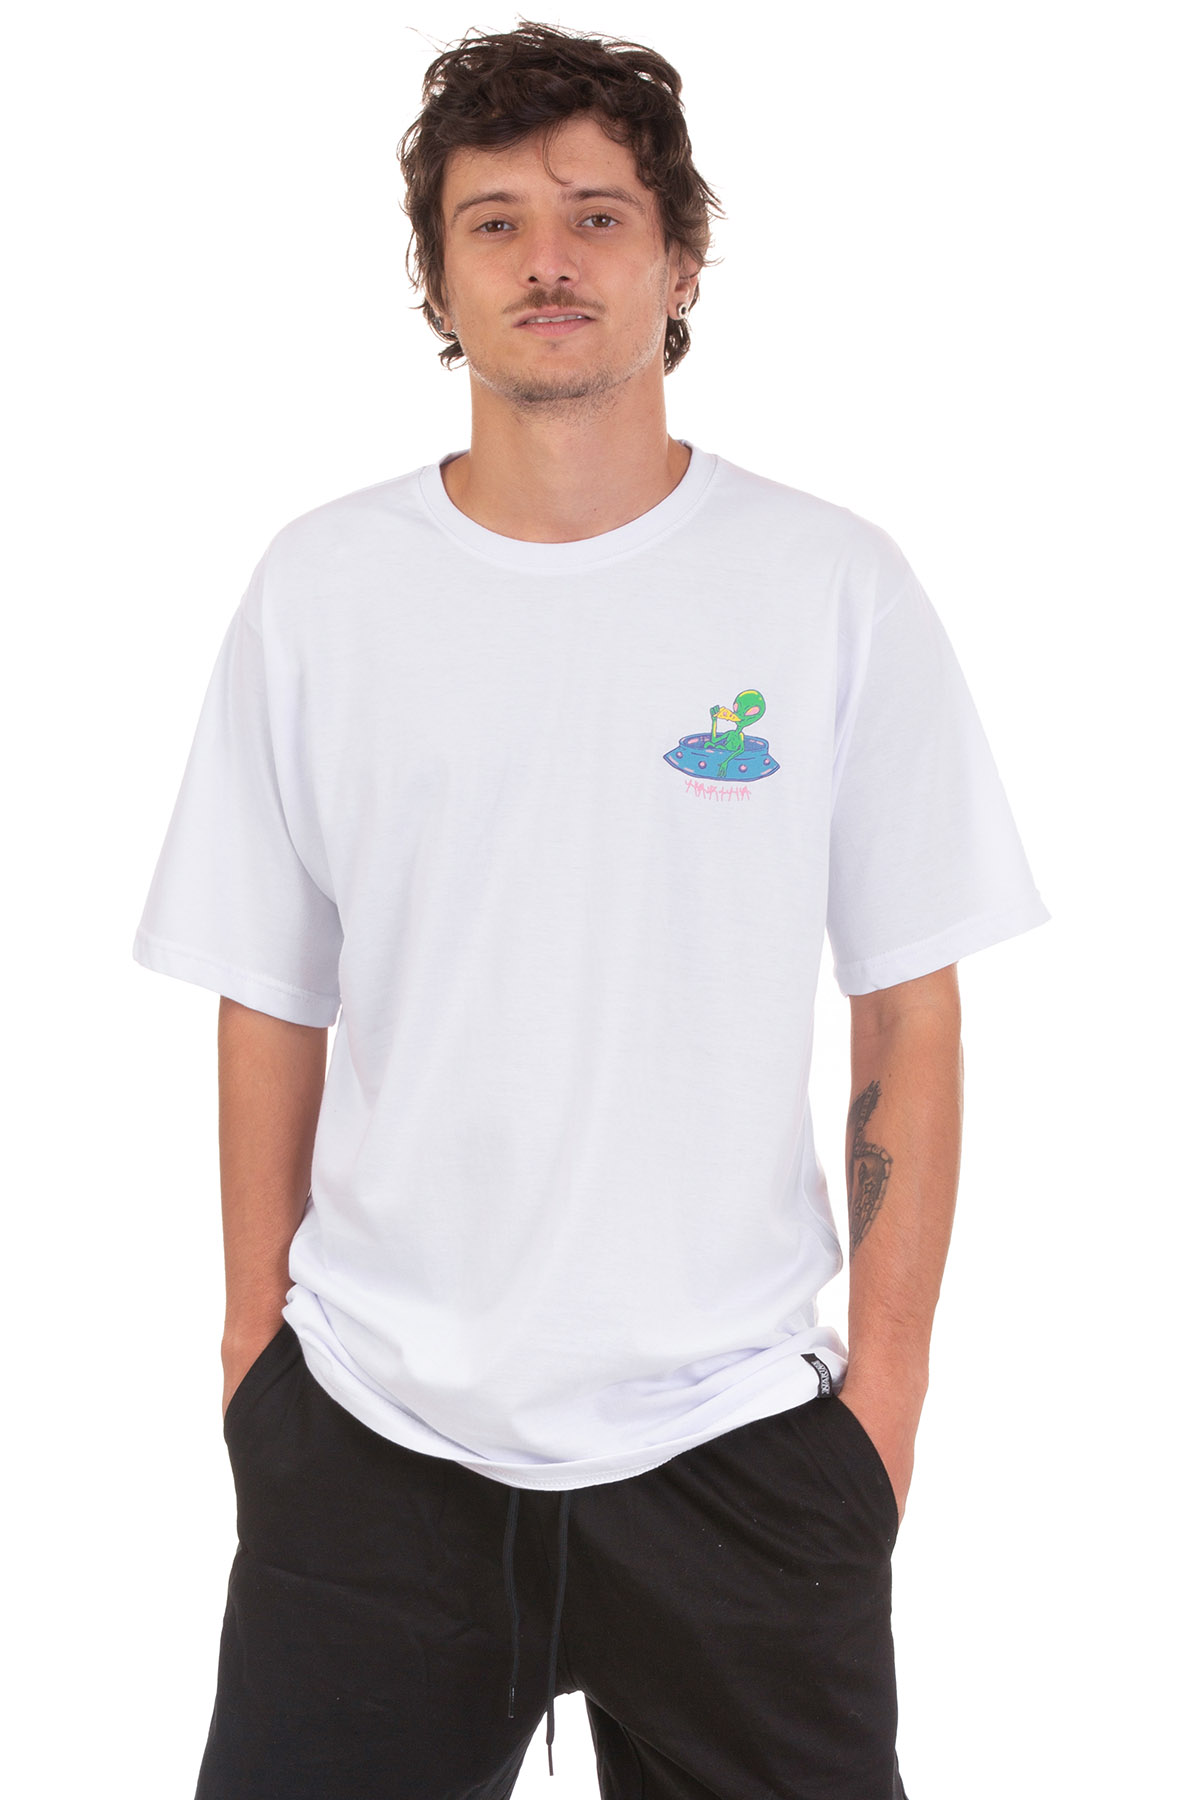 Camiseta  Manga Curta Narina Skate Abdução